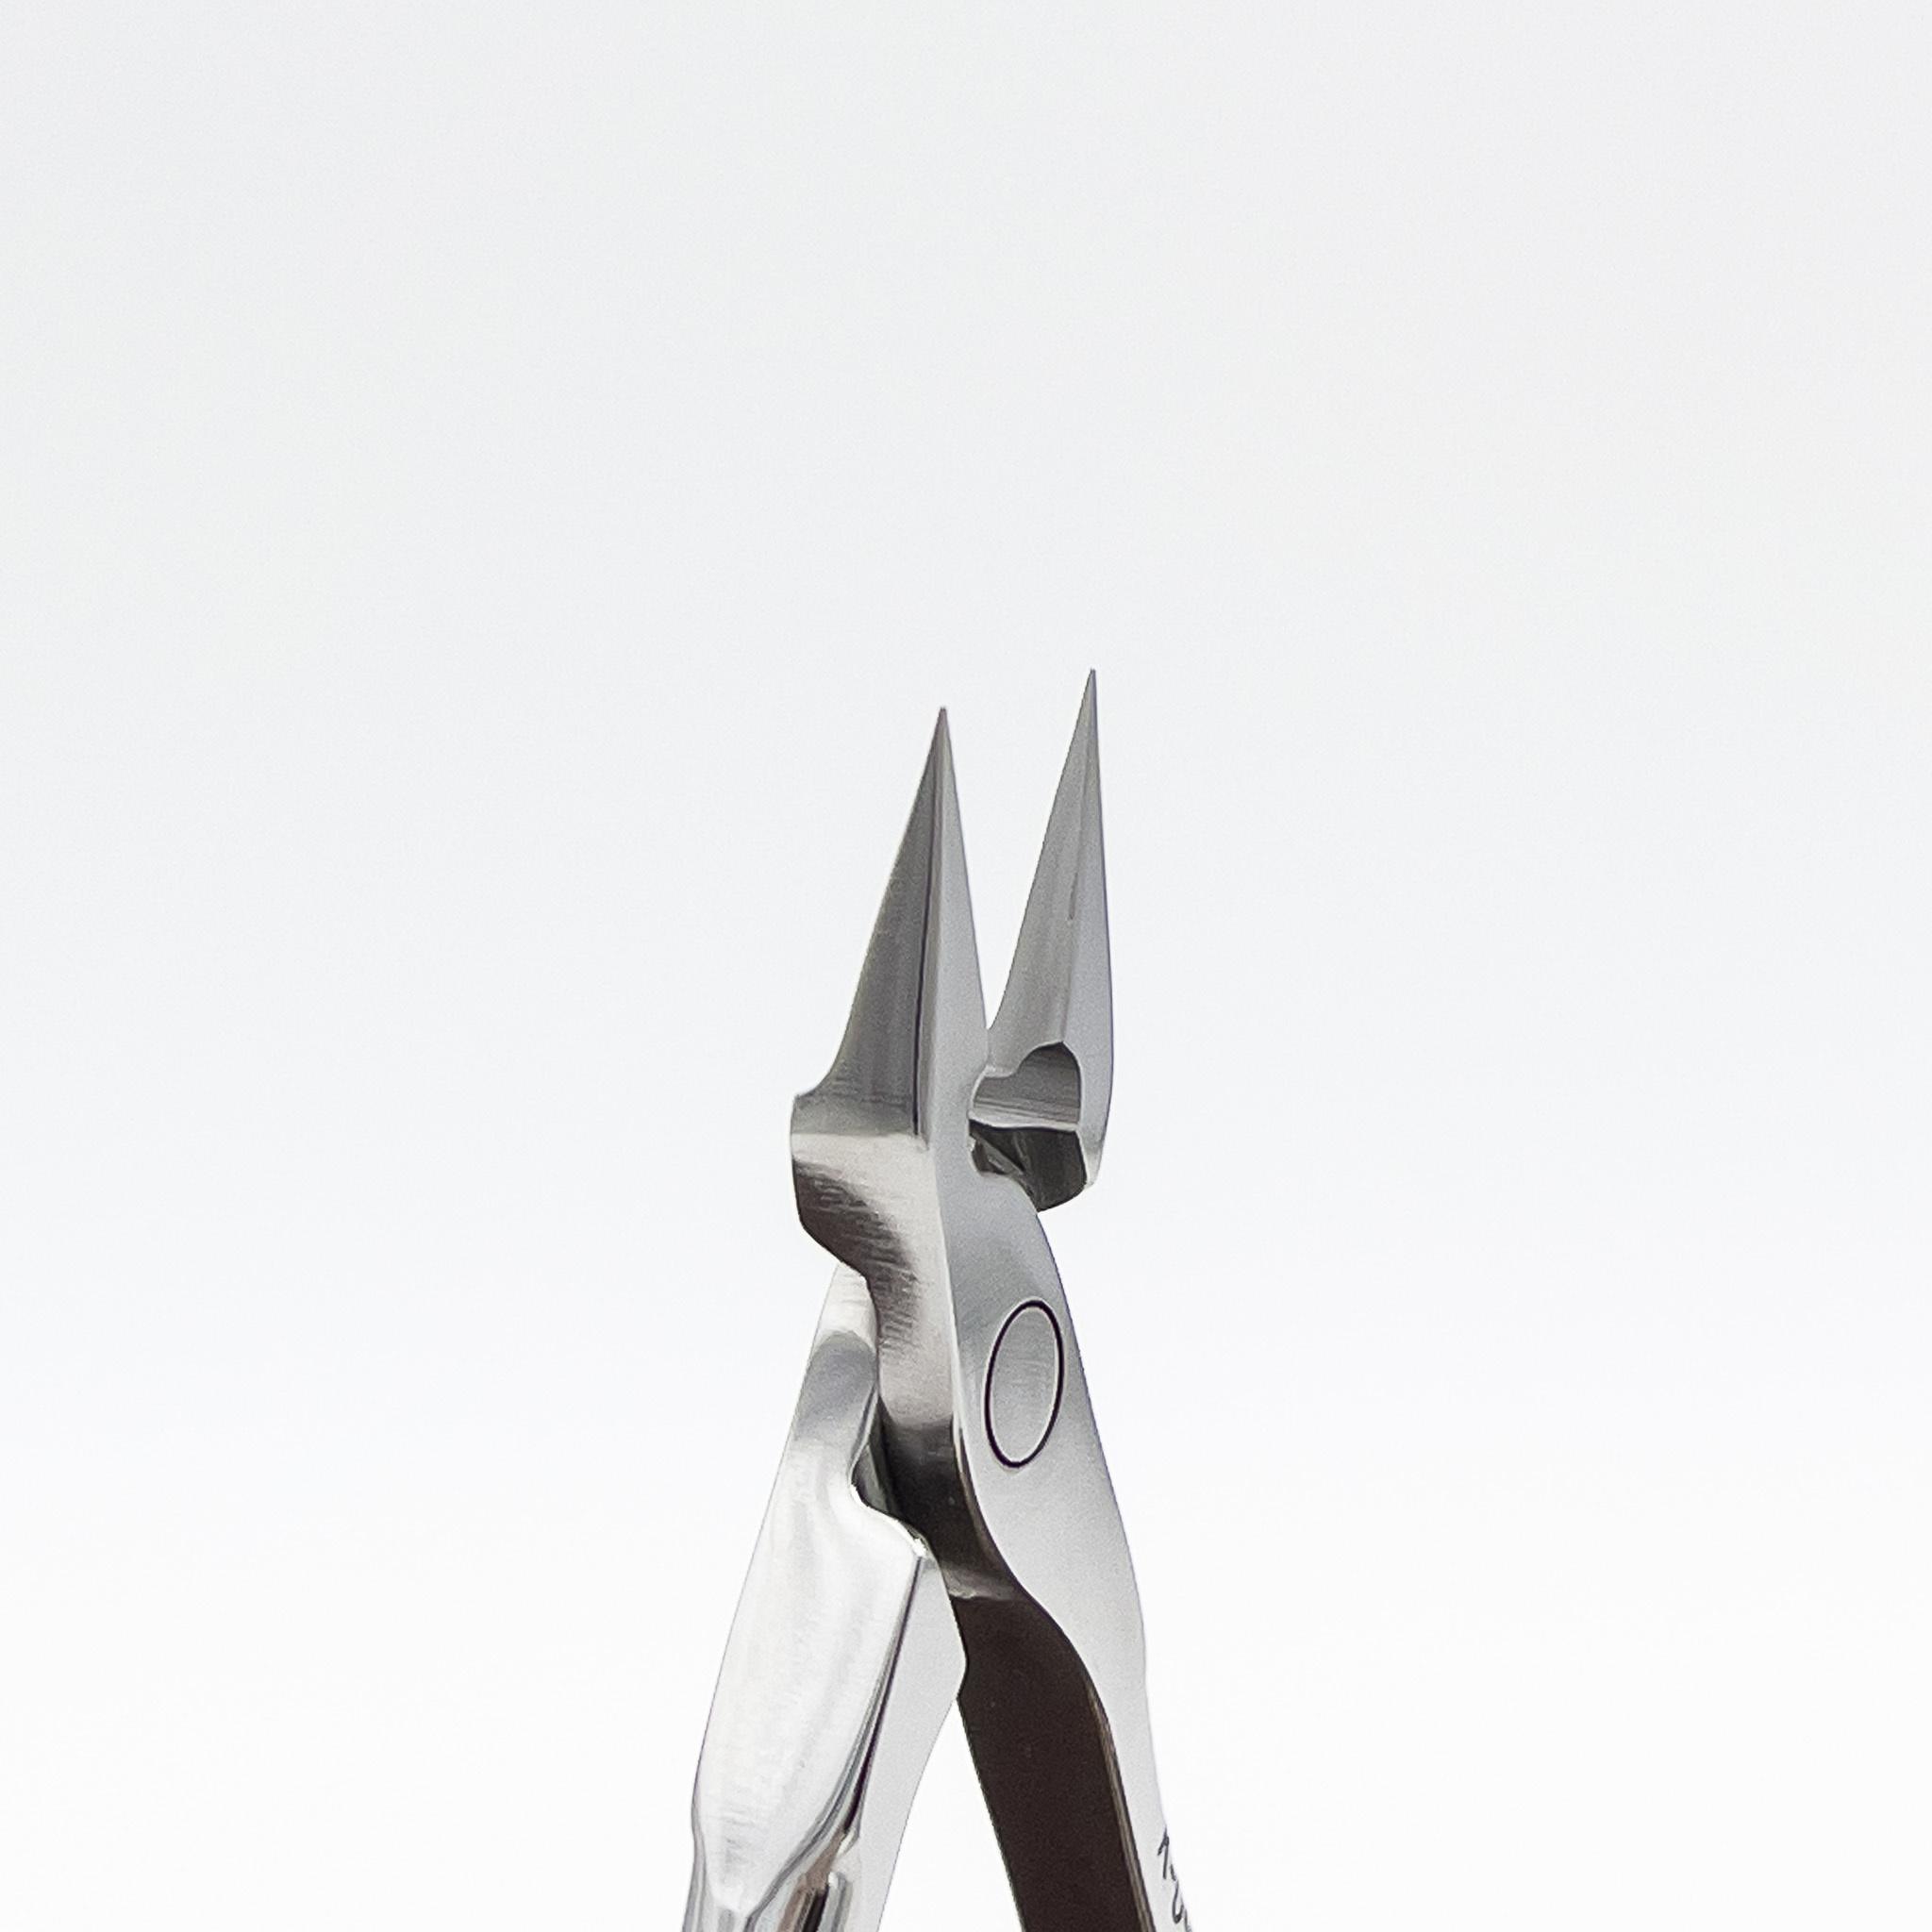 STALENA Hoektang spits - klein met  ergonomische handgreep K-09 (N7-61-12)